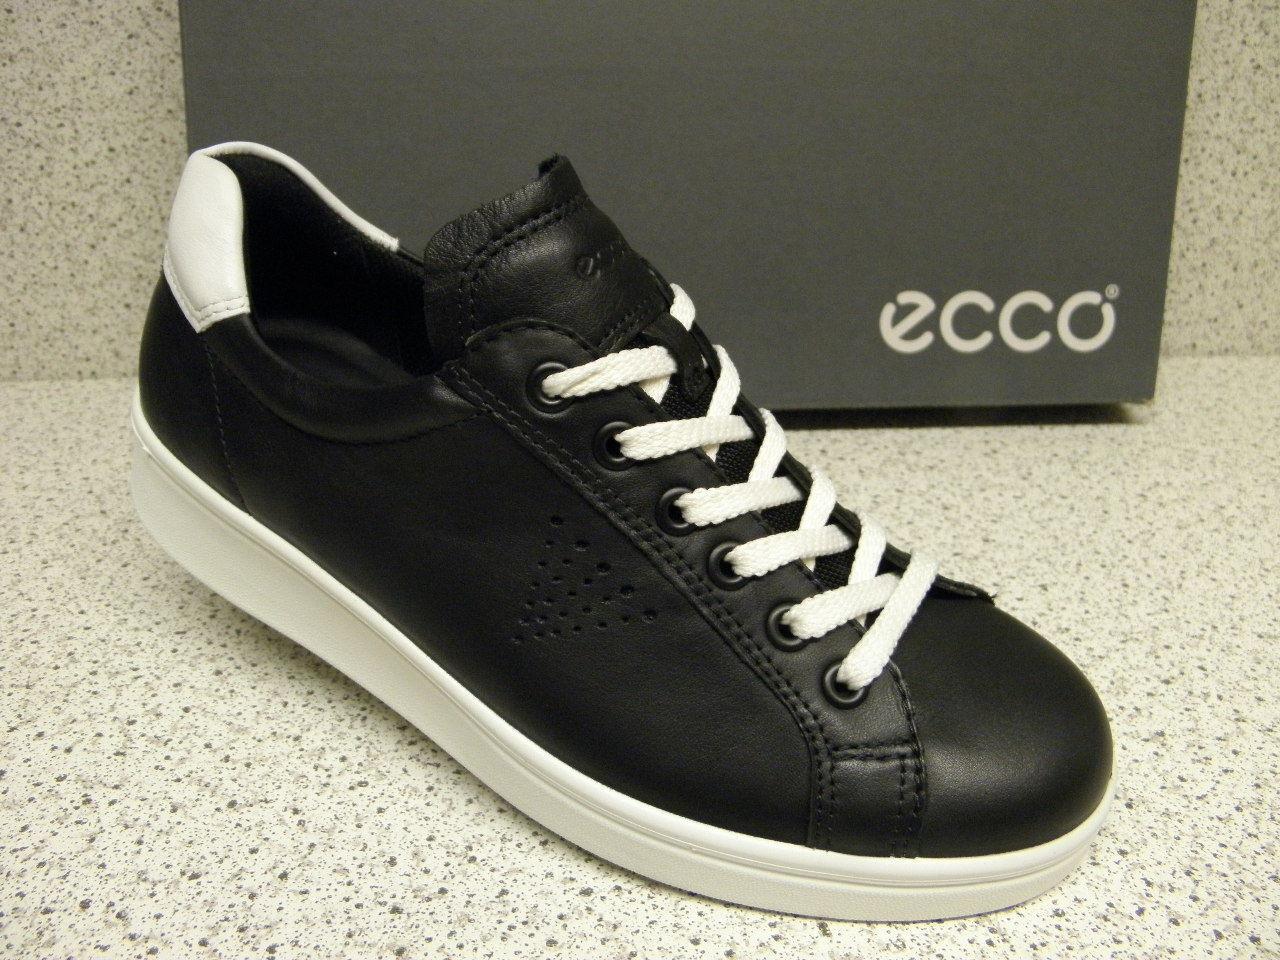 bisher rotuziert, ® Ecco (E69) Premium Socken gratis +